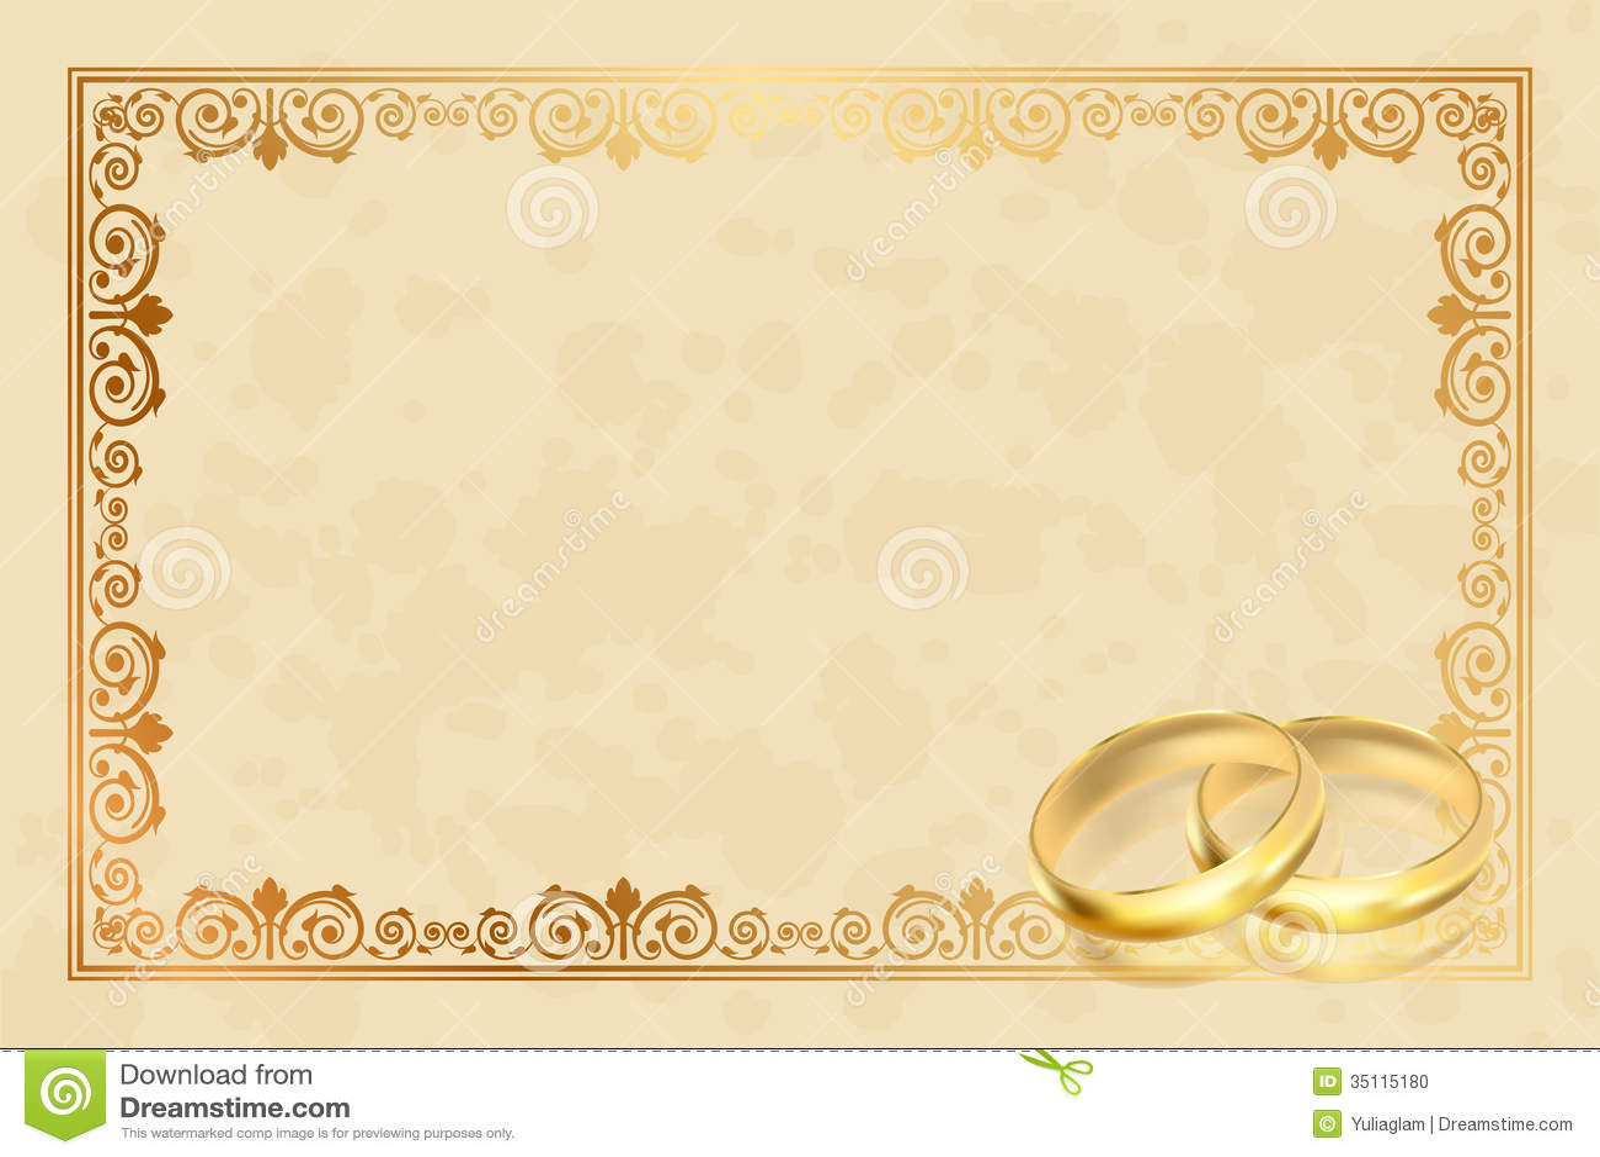 Wedding Anniversary Invitation Templates